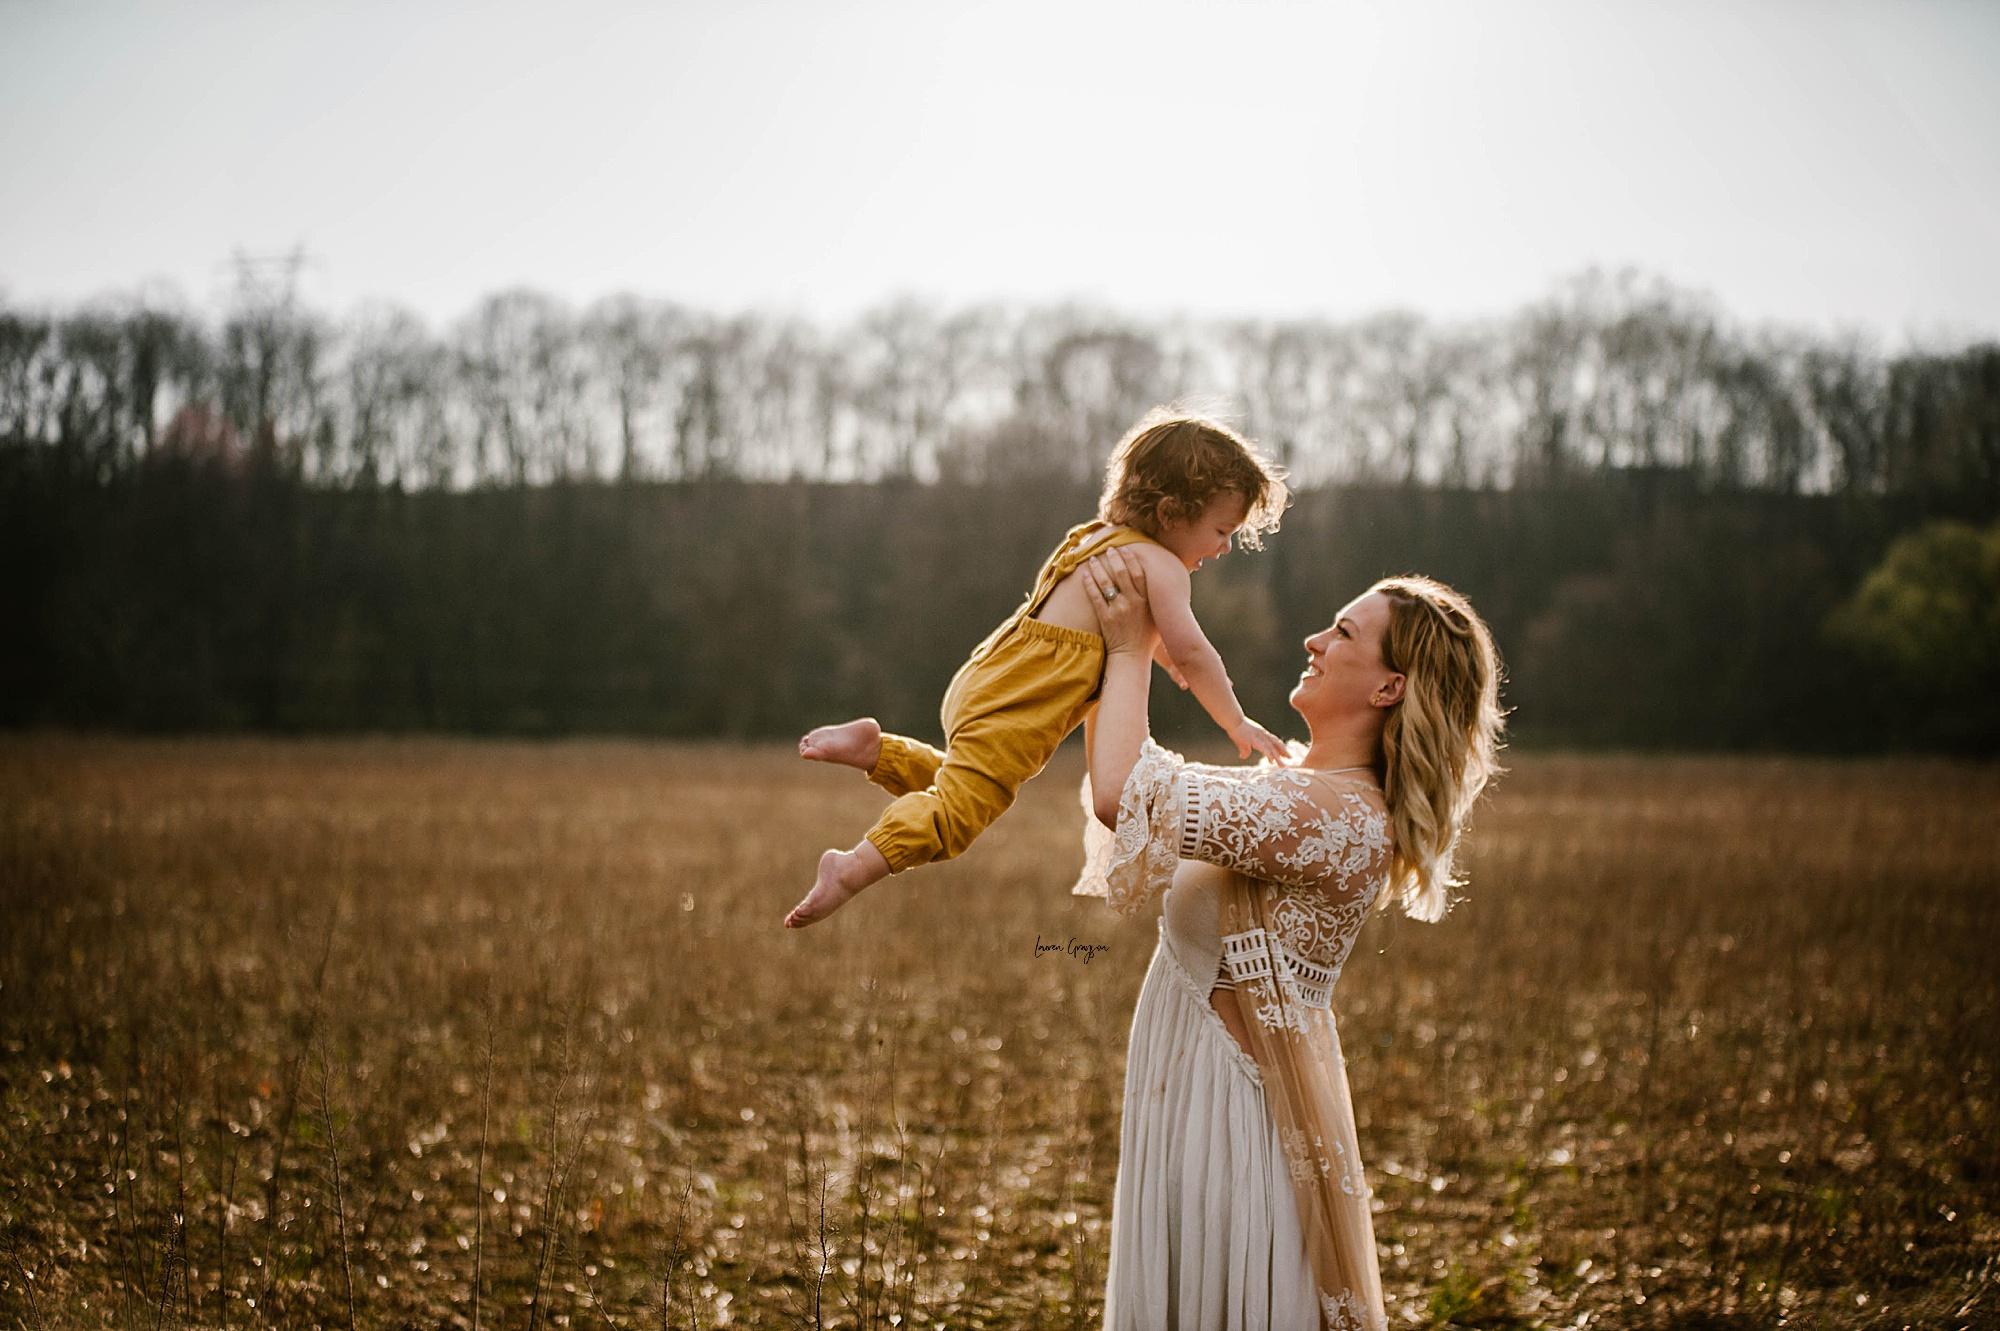 lauren-grayson-photography-akron-ohio-family-mom-boys-field-spring-outdoor-session_0011.jpg